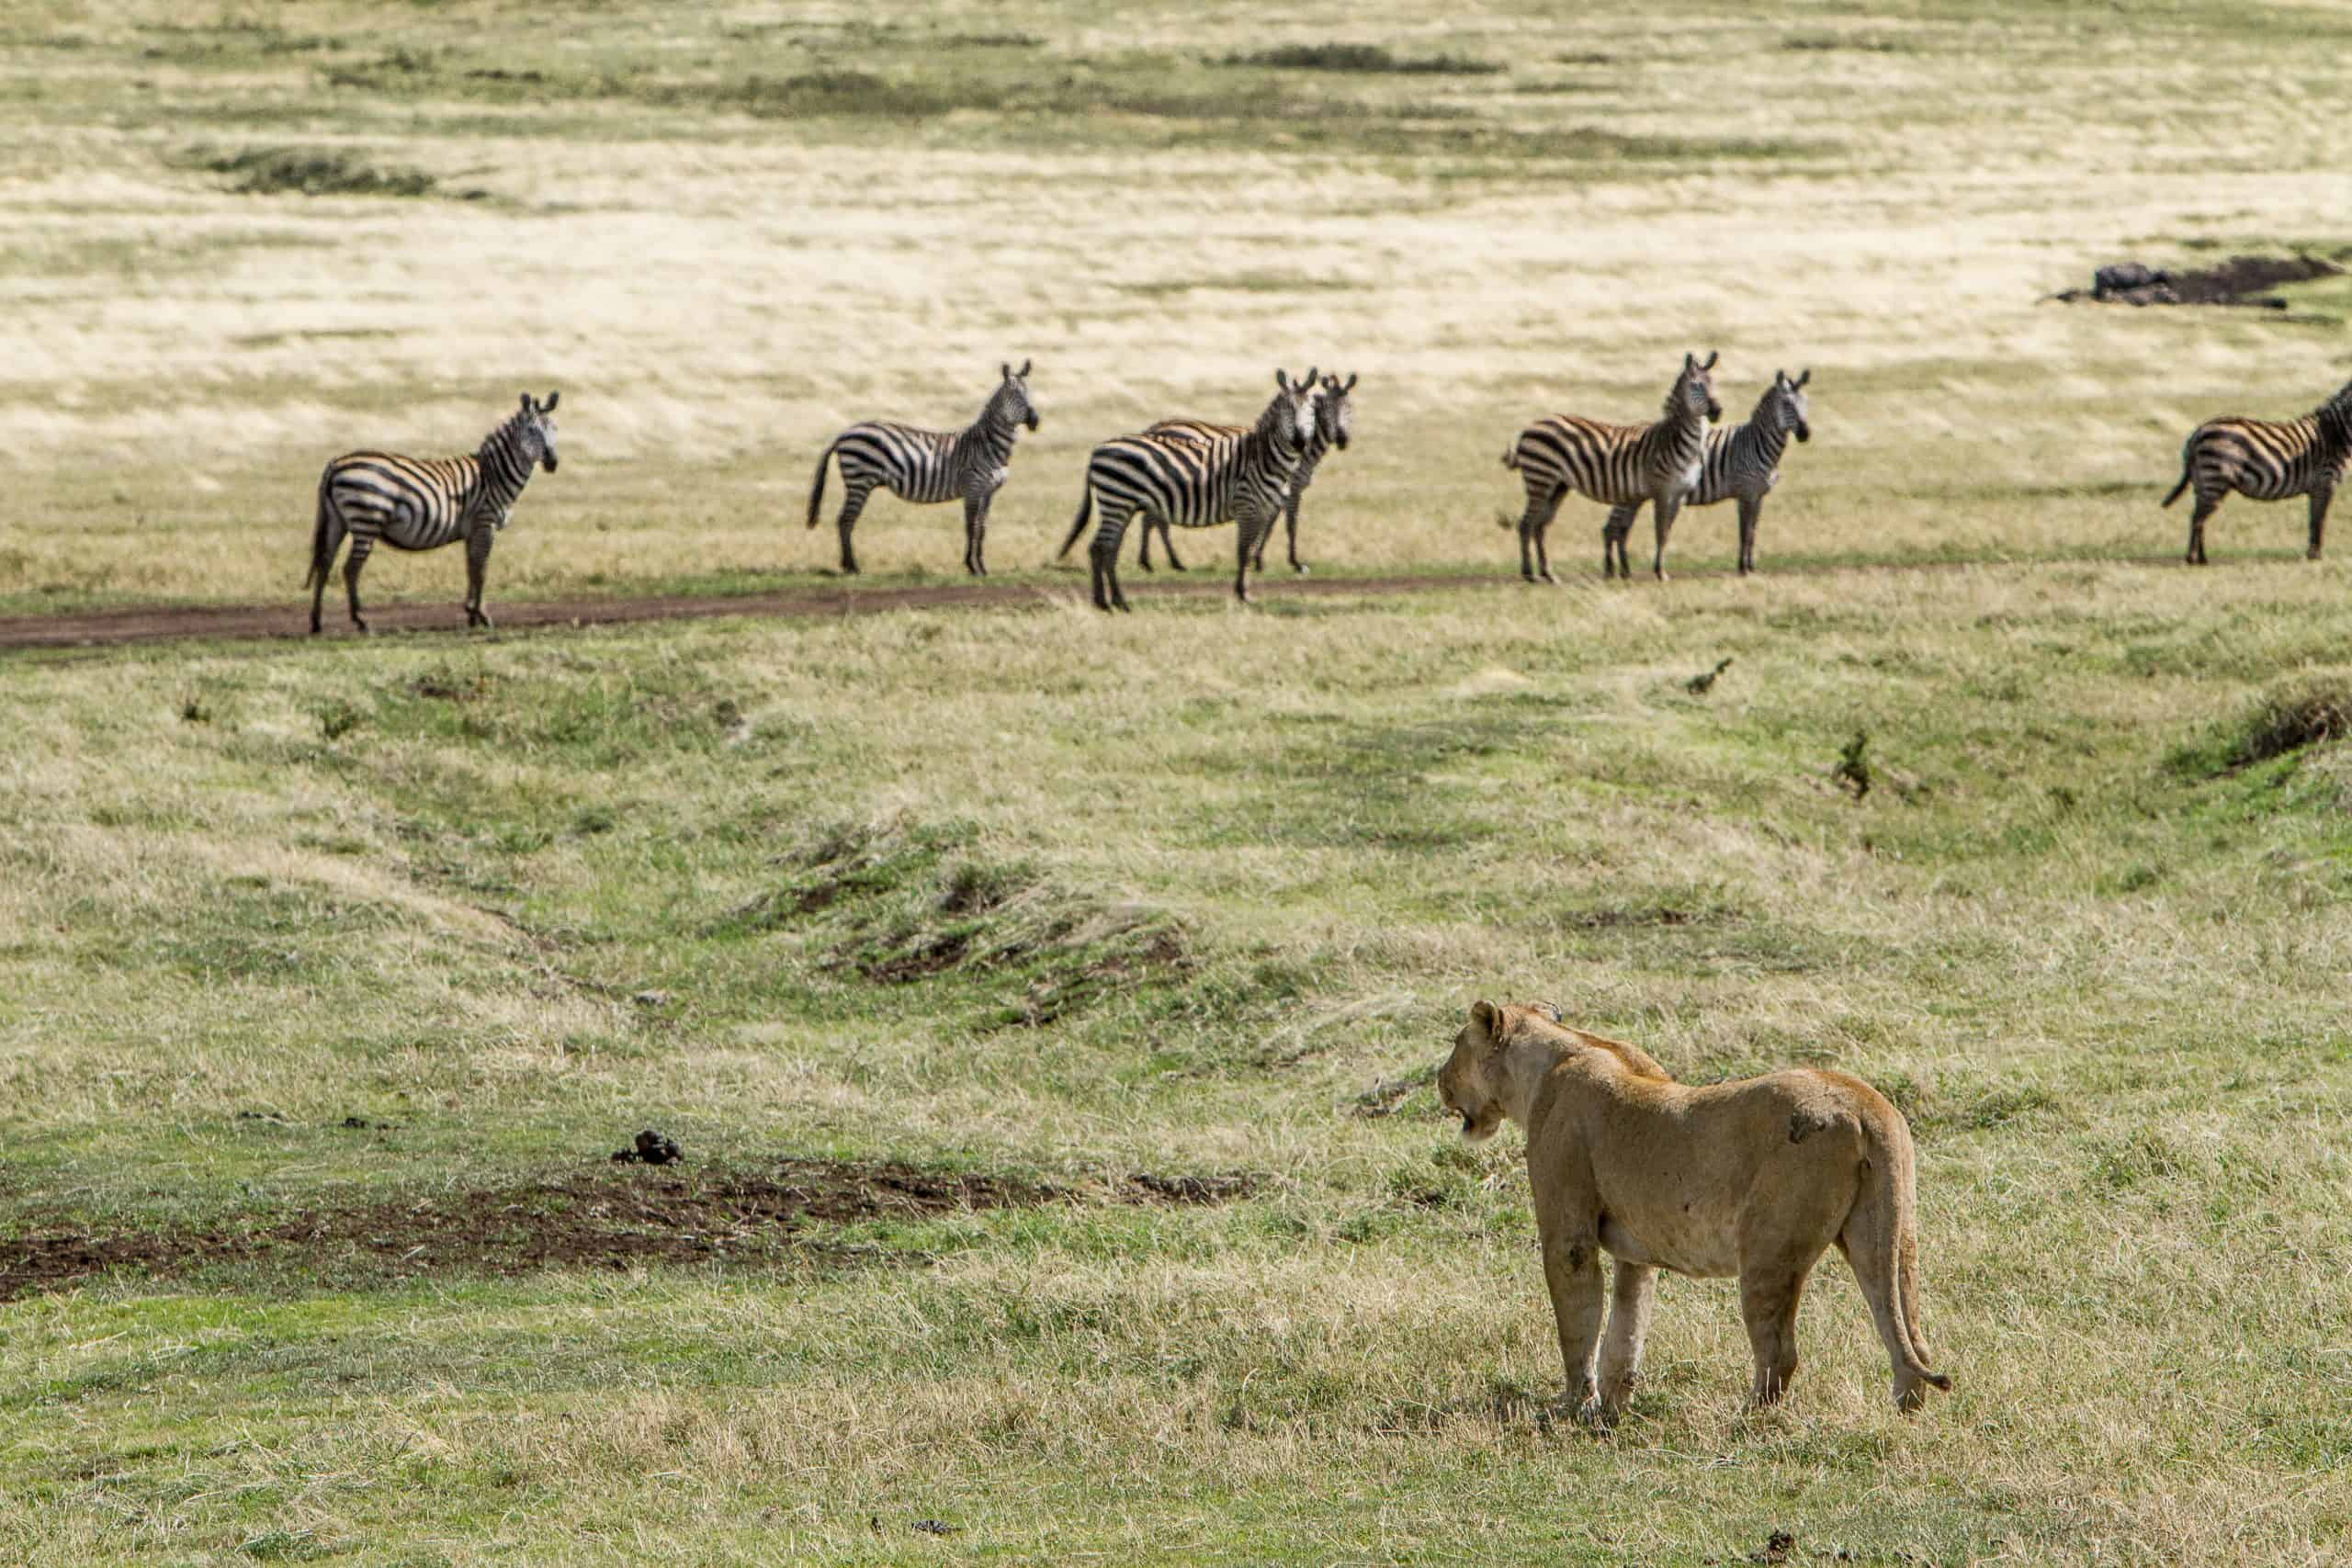 Burigi Chato Safaris Co. Ltd Serengeti Norongoro Safari Best Tour Agency Company Operator In Moshi Arusha Tanzania Africa) (50)